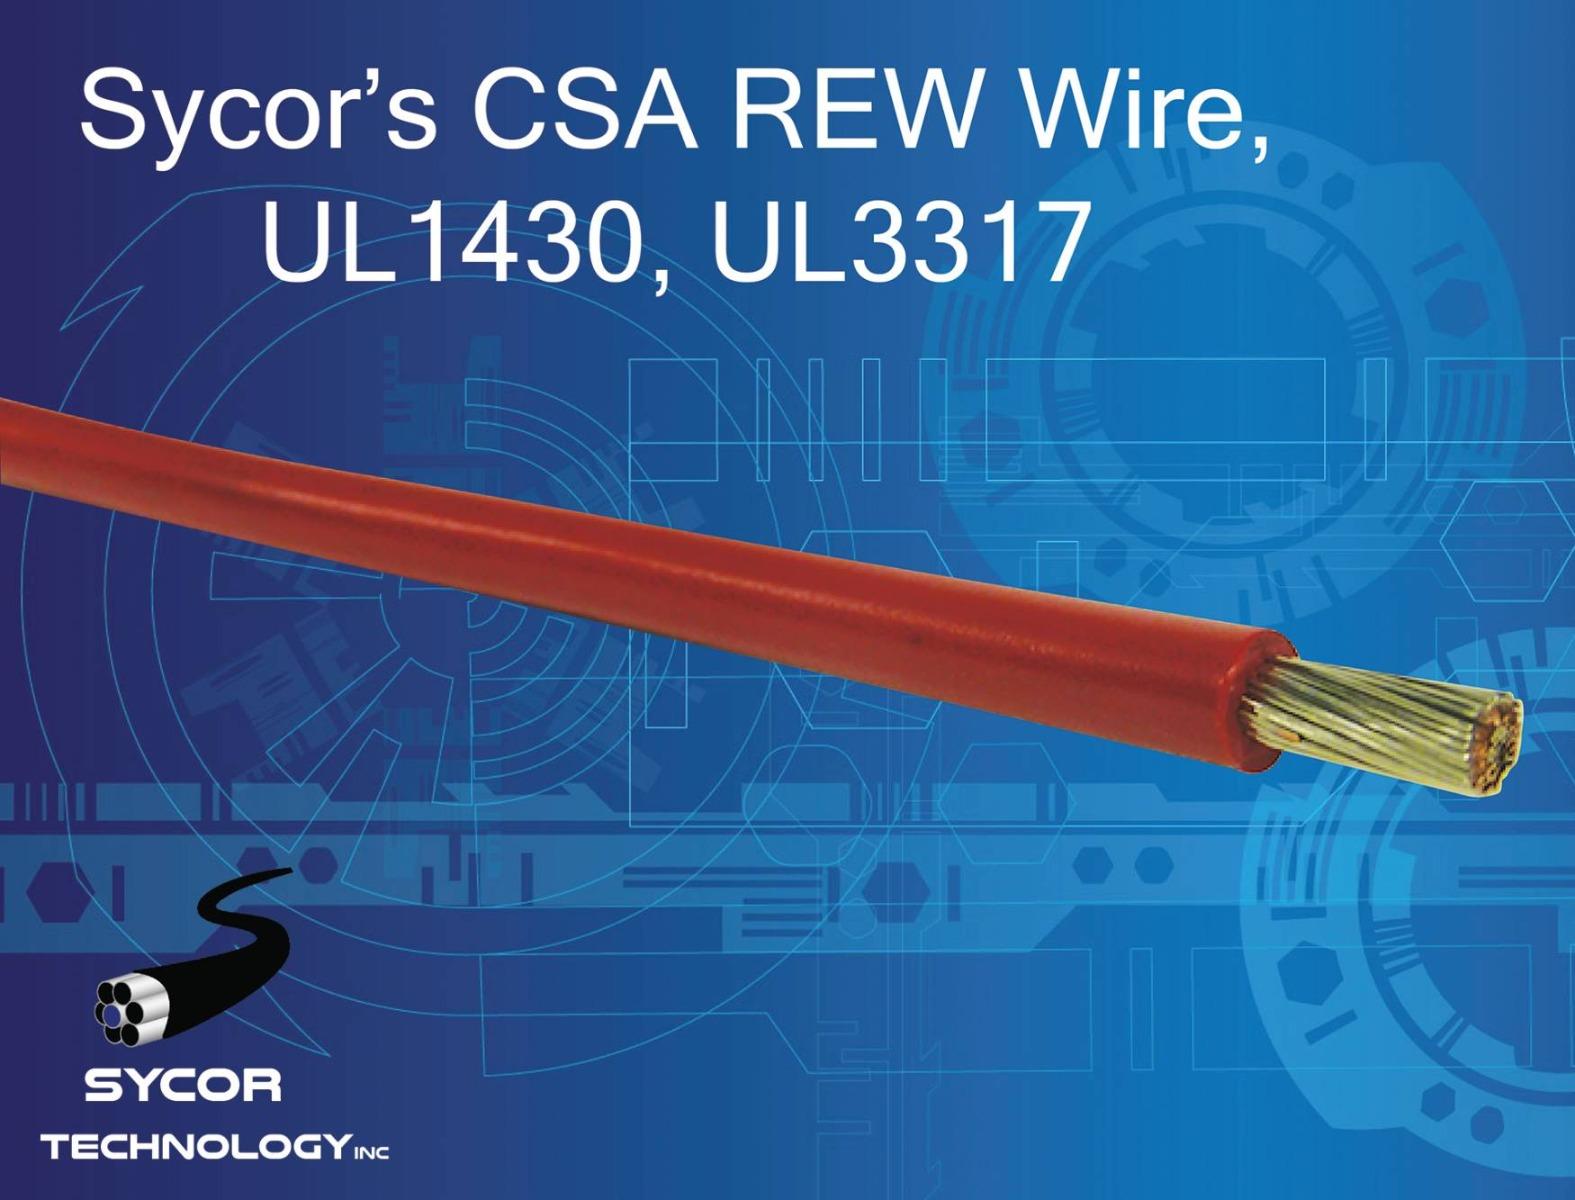 CSA REW Wire, UL1430, UL3317